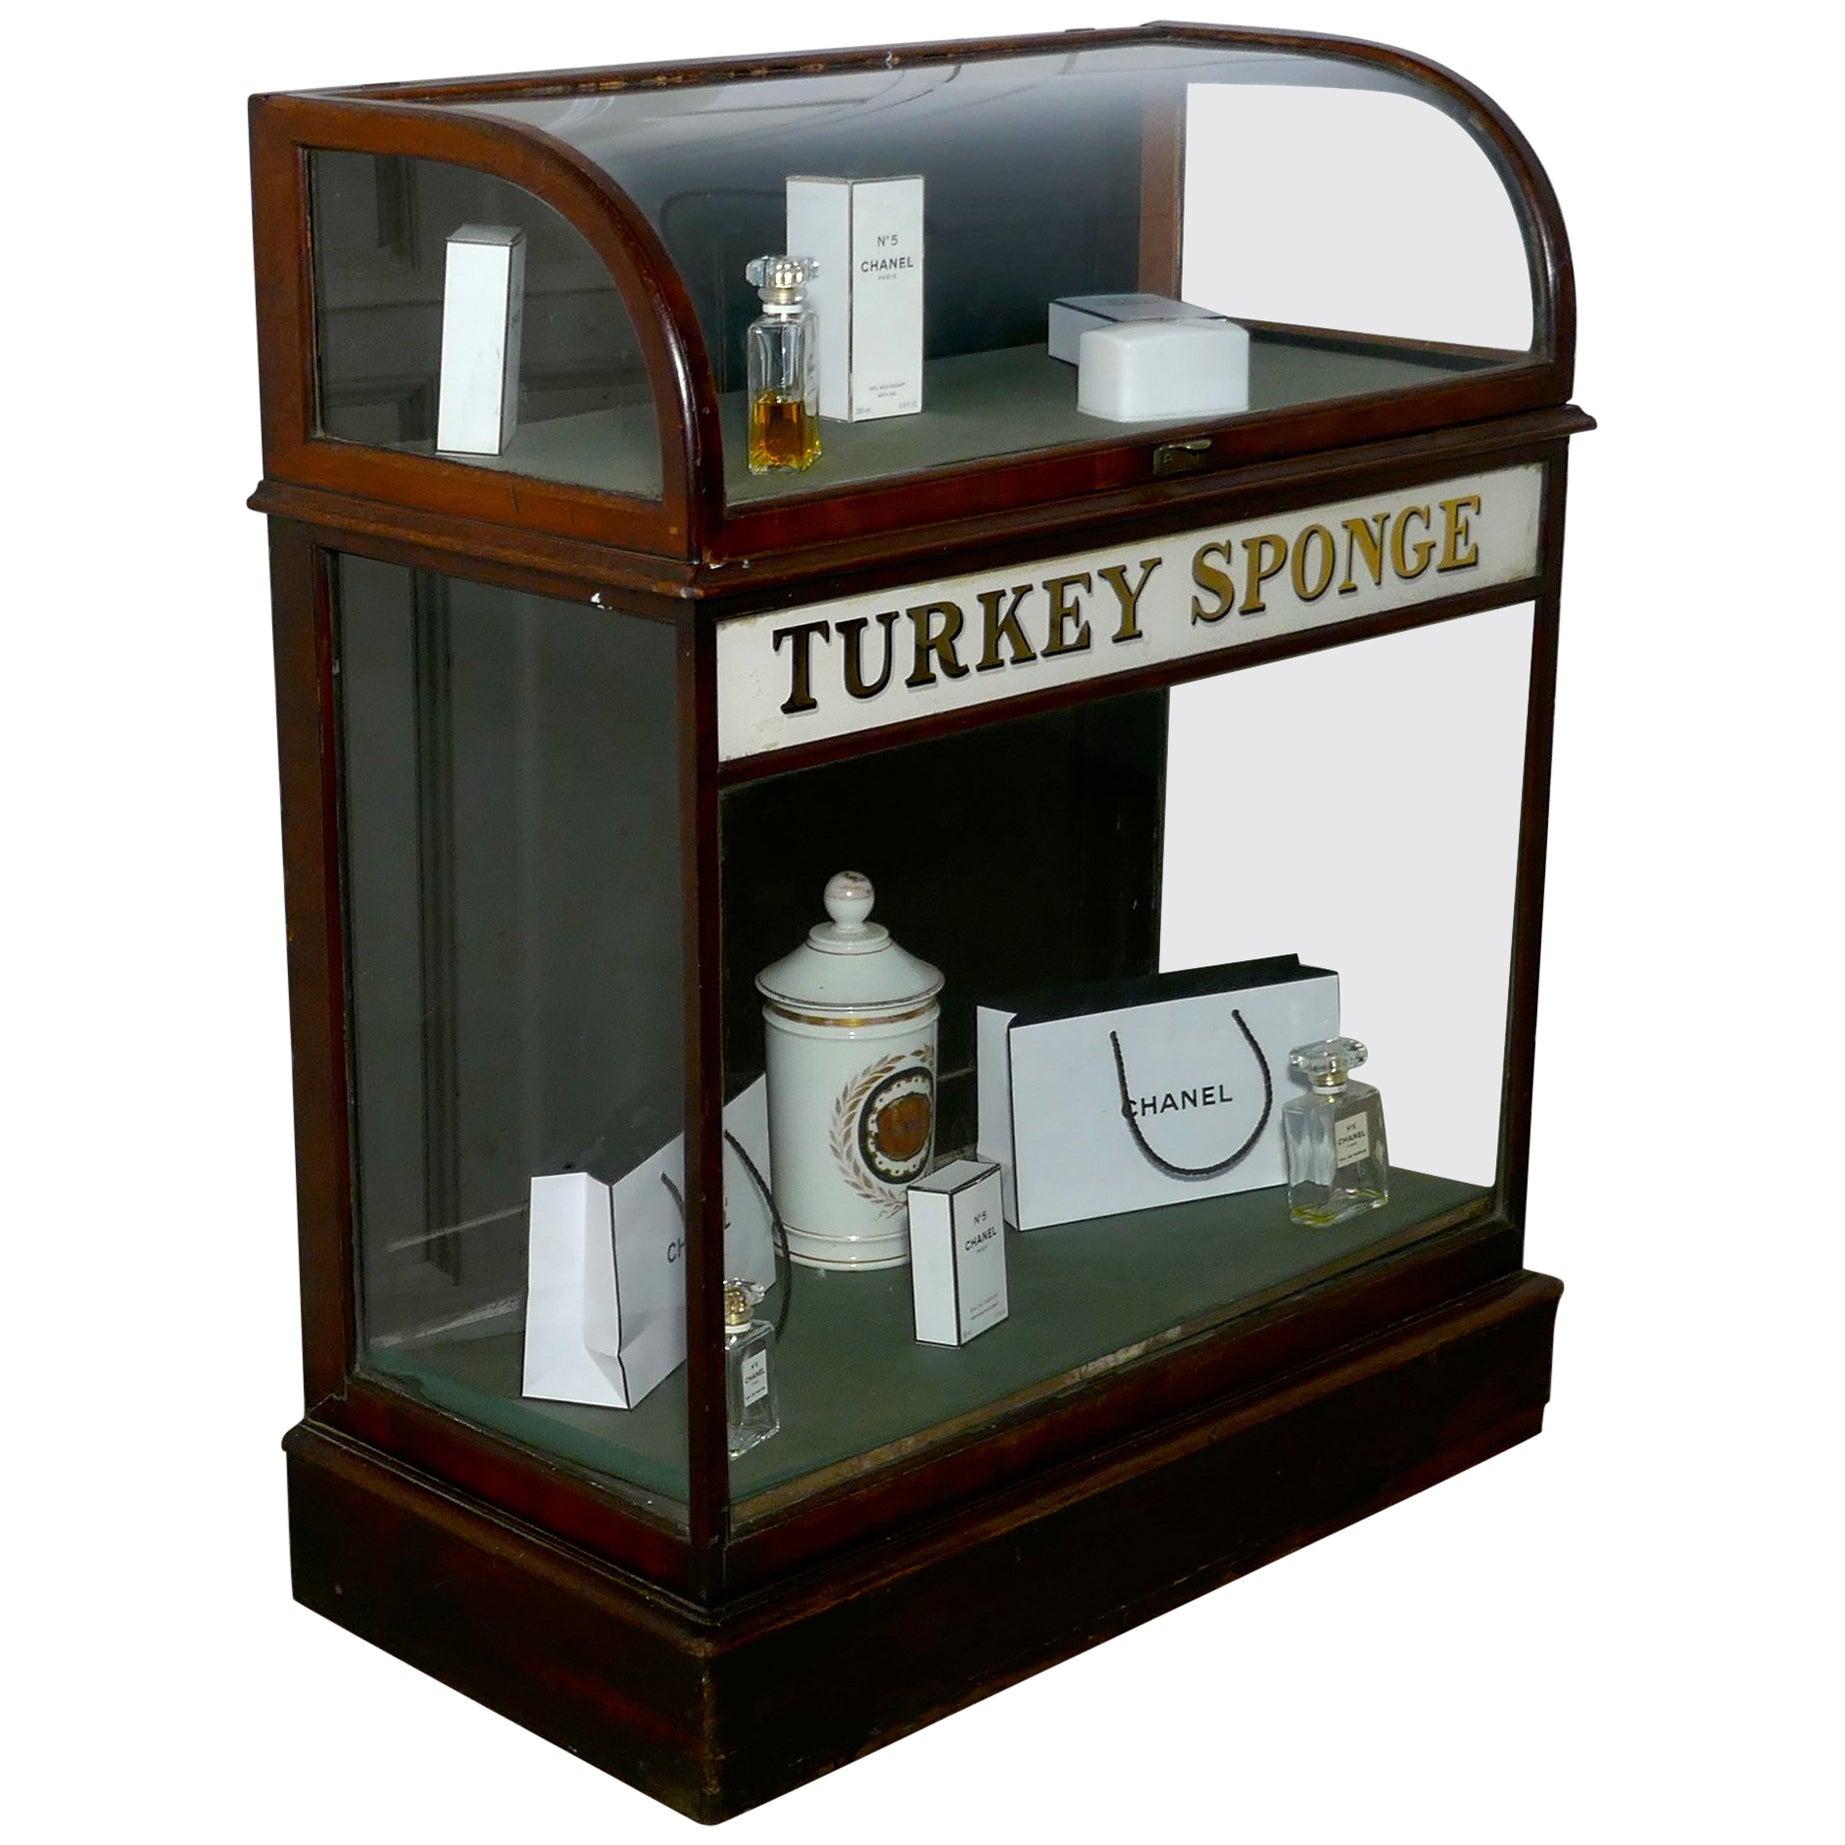 Turkey Sponge Chemist Shop Display Cabinet